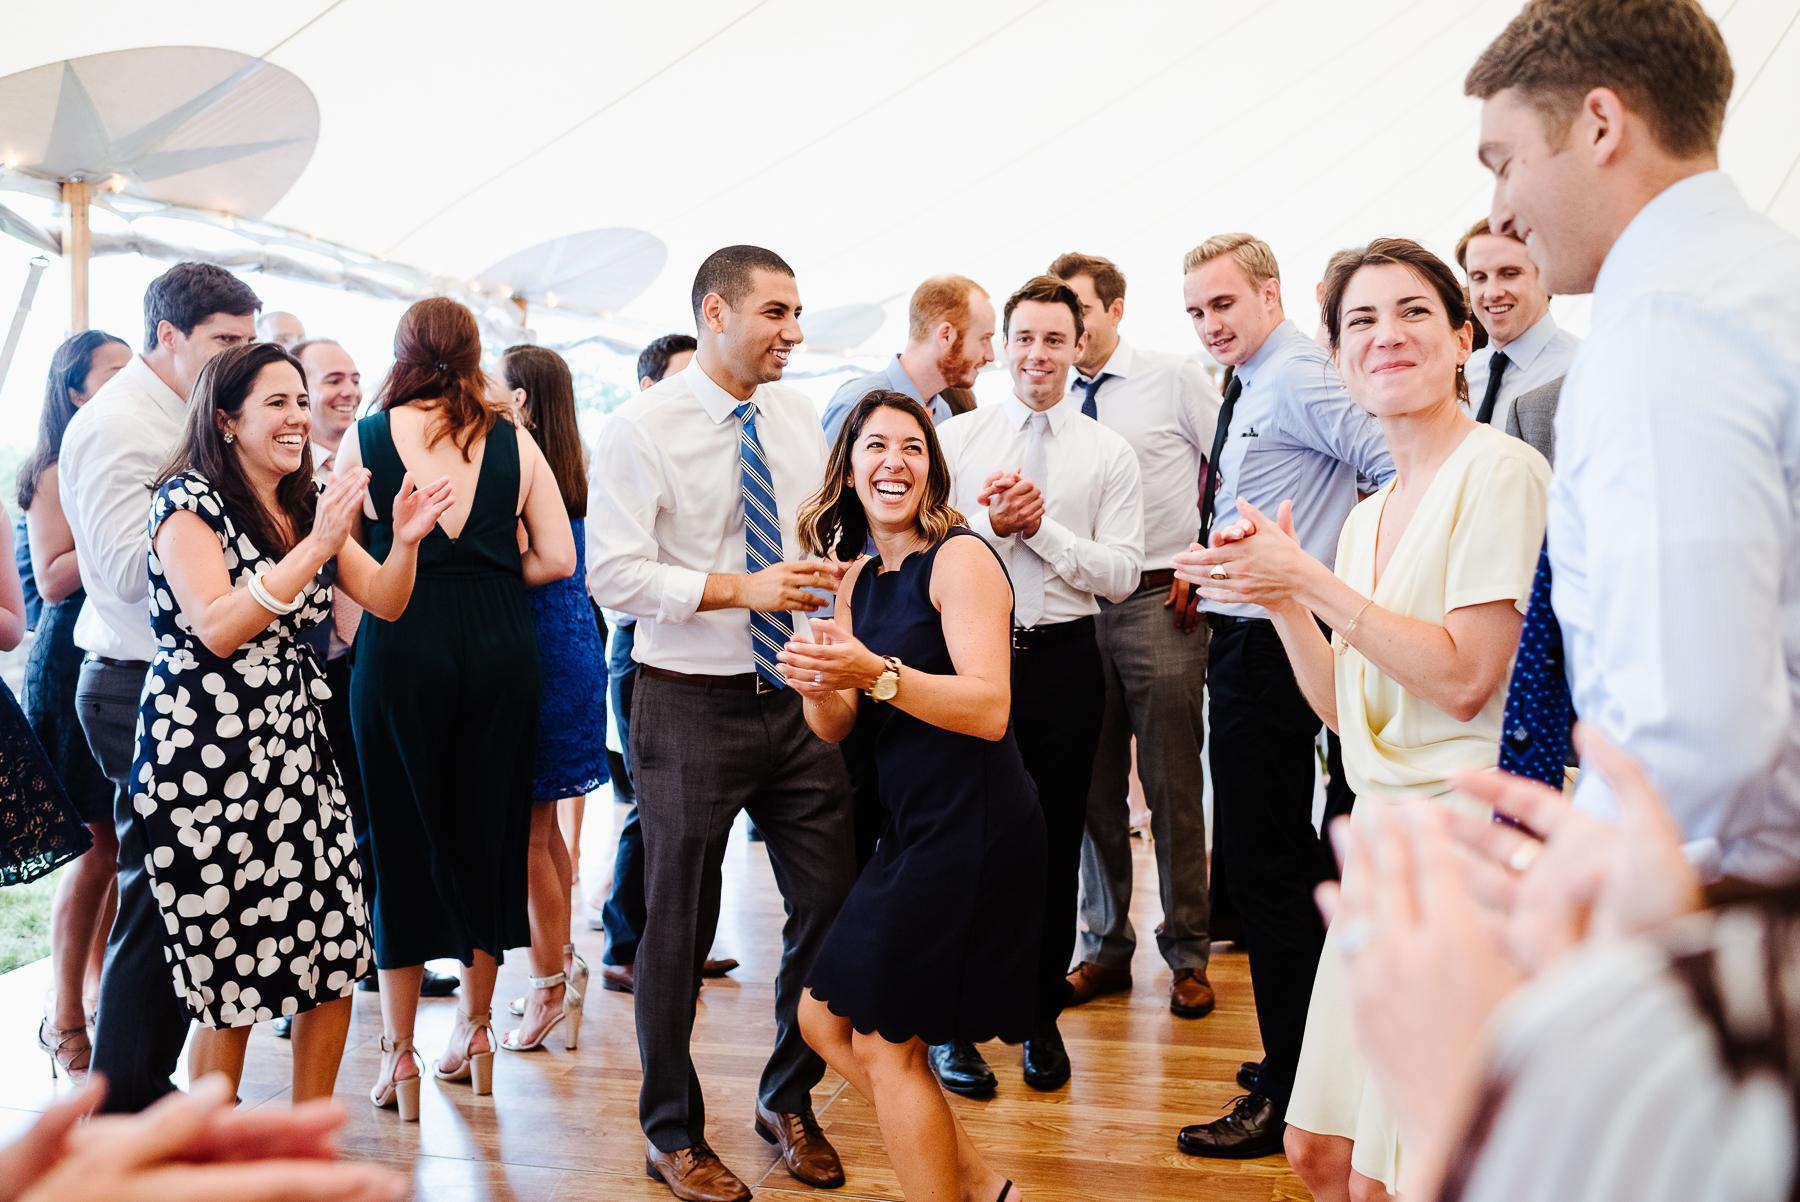 114-J Crew Wedding New Jersey Wedding Photographer J Crew Weddings.jpg